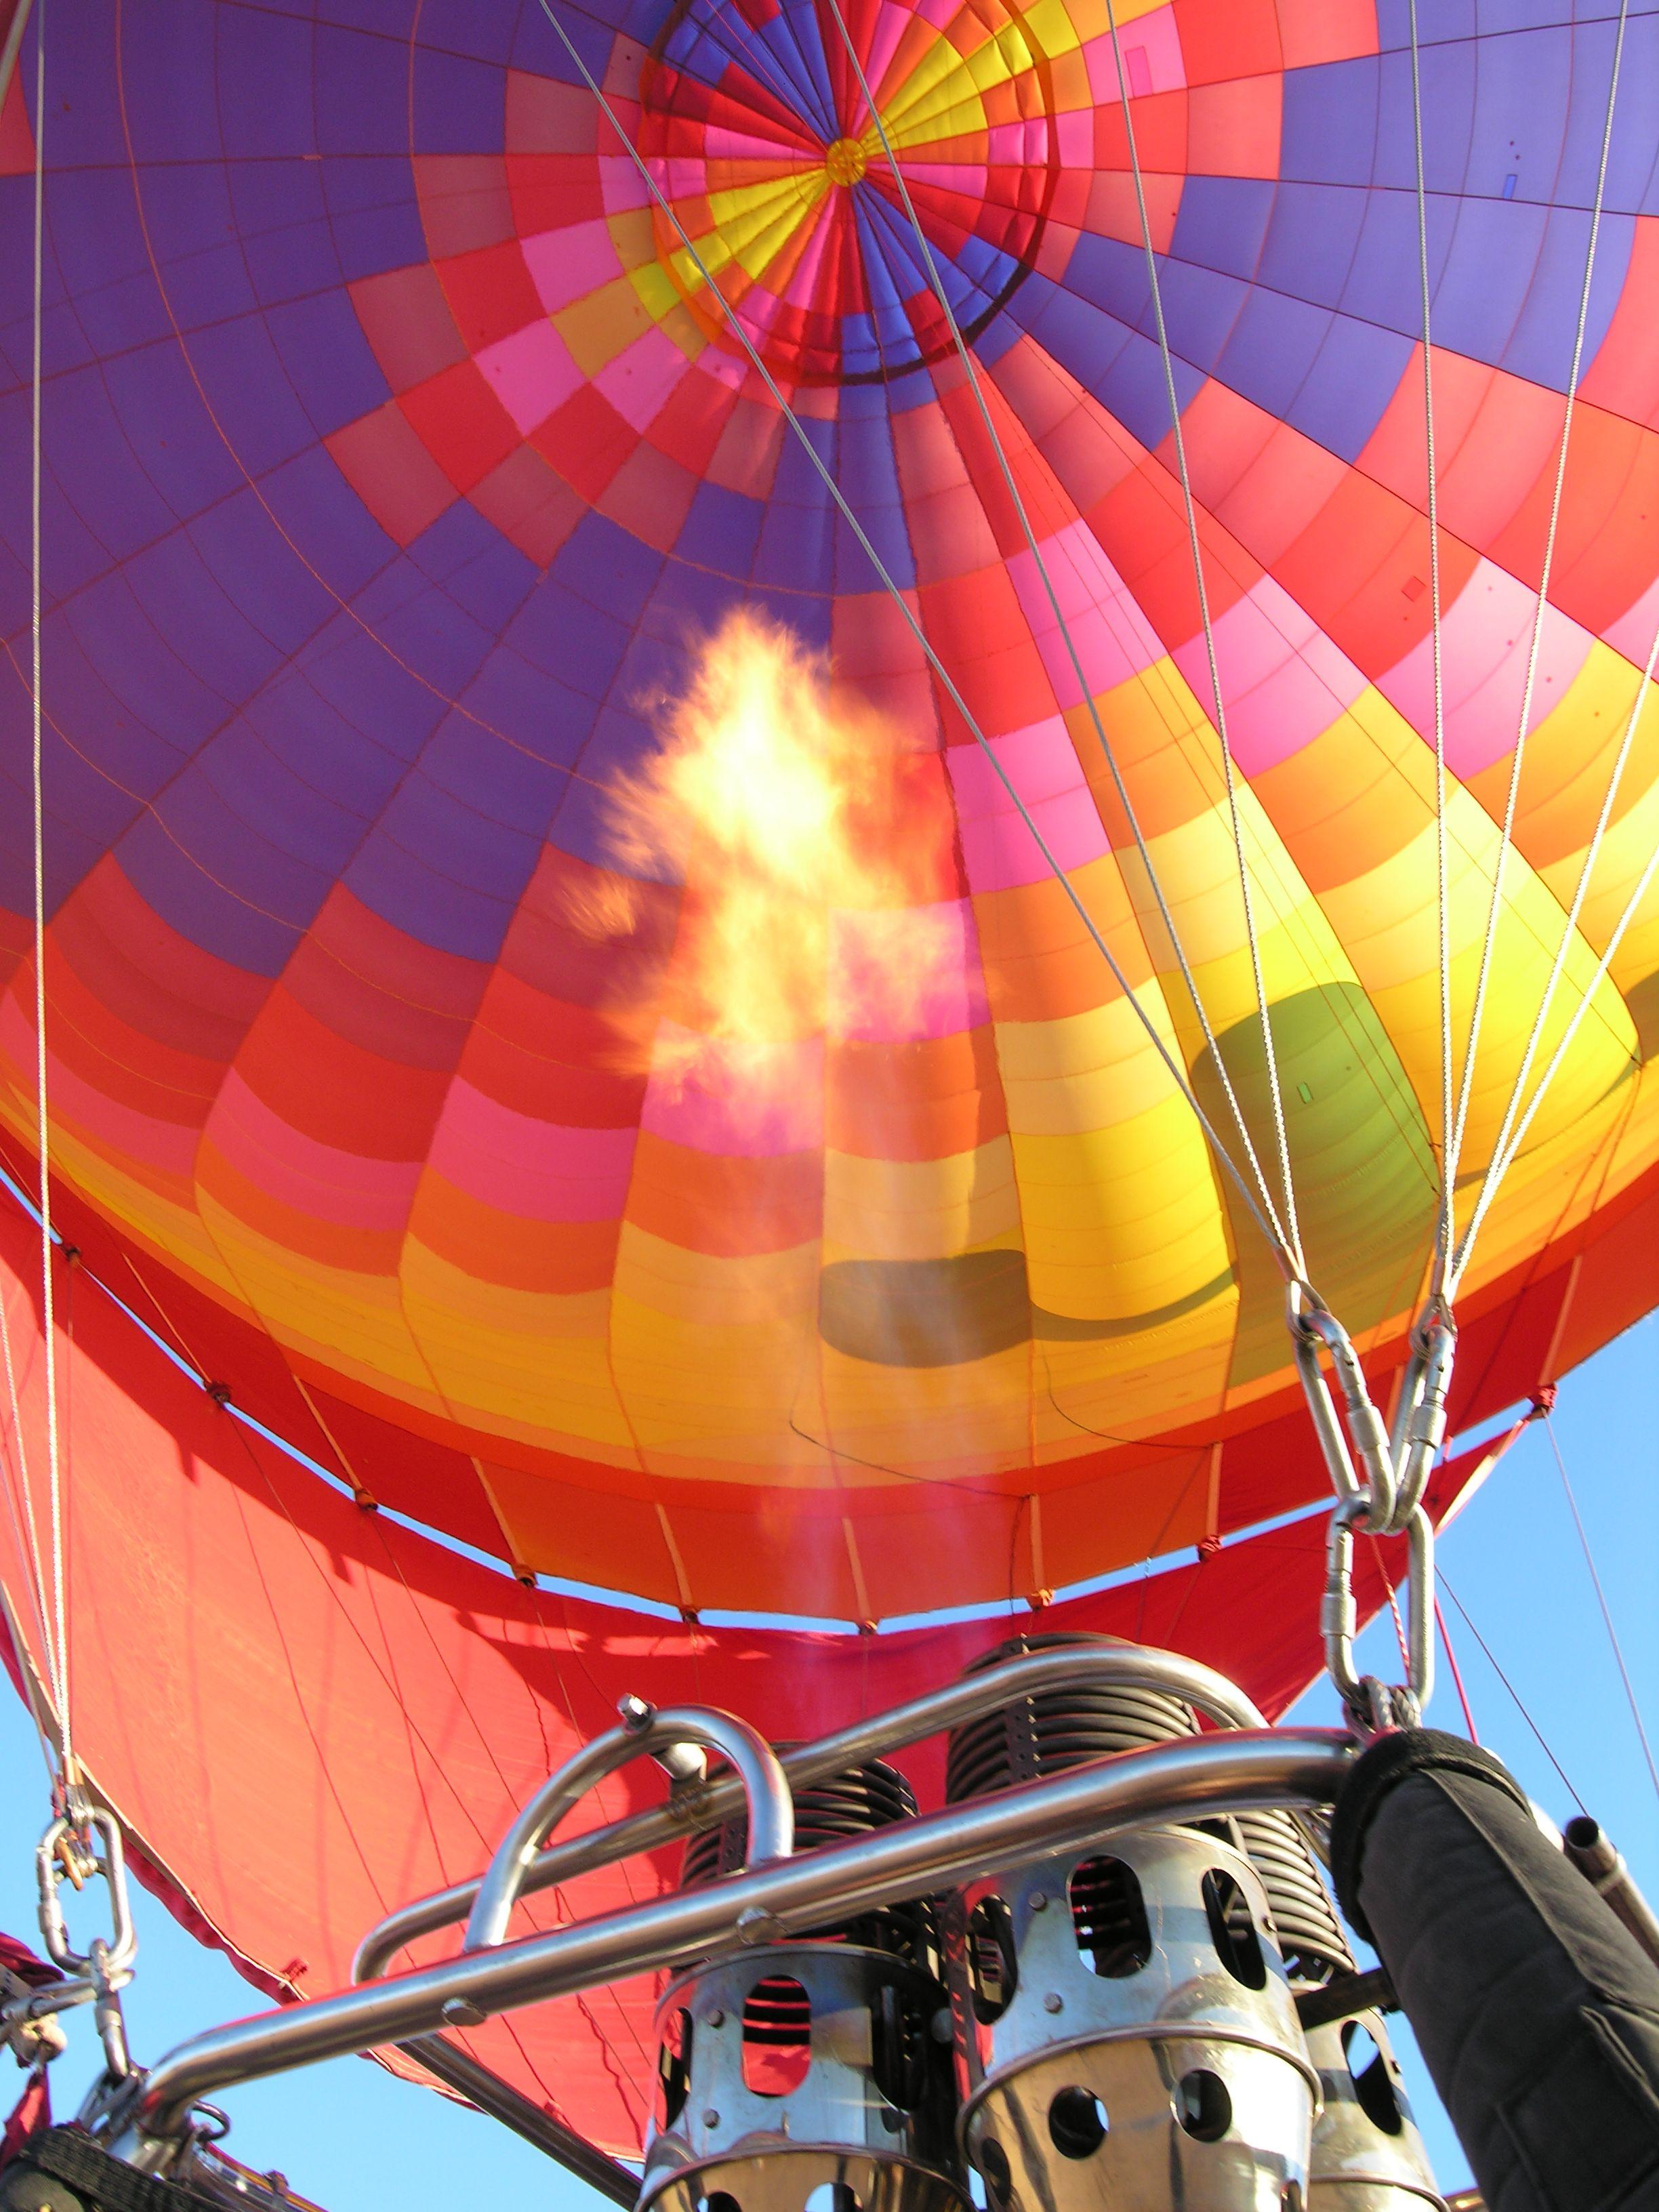 We have lift off! Balloon rides, Hot air balloon rides